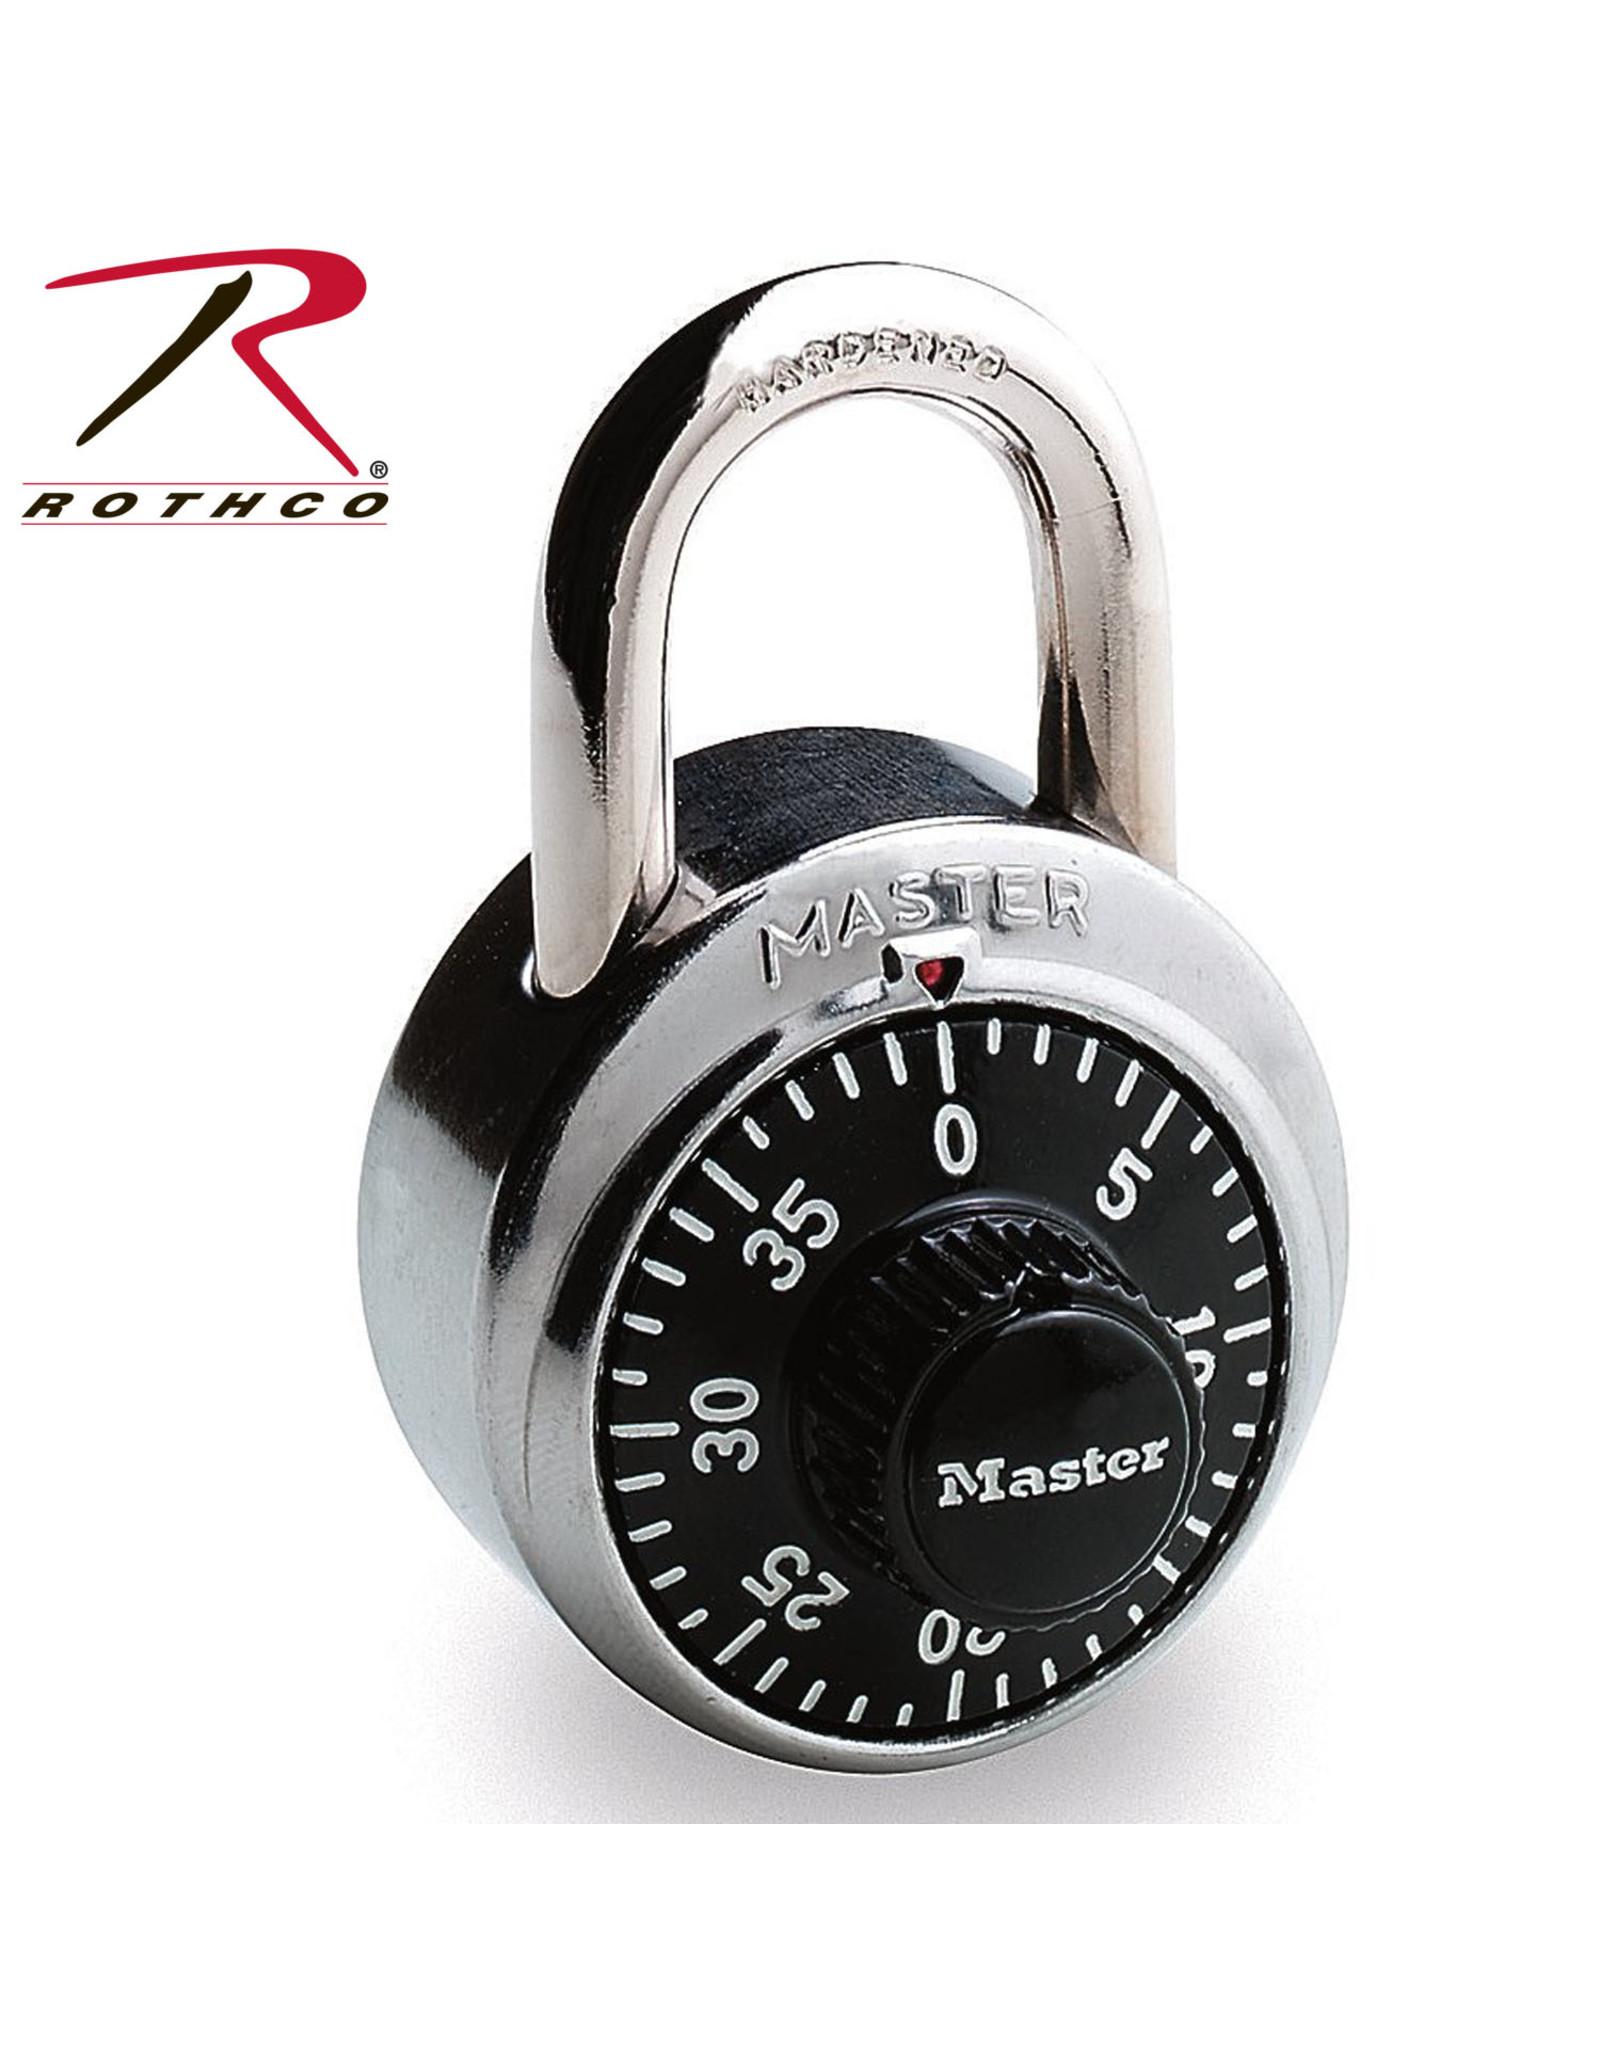 Master Combination Lock